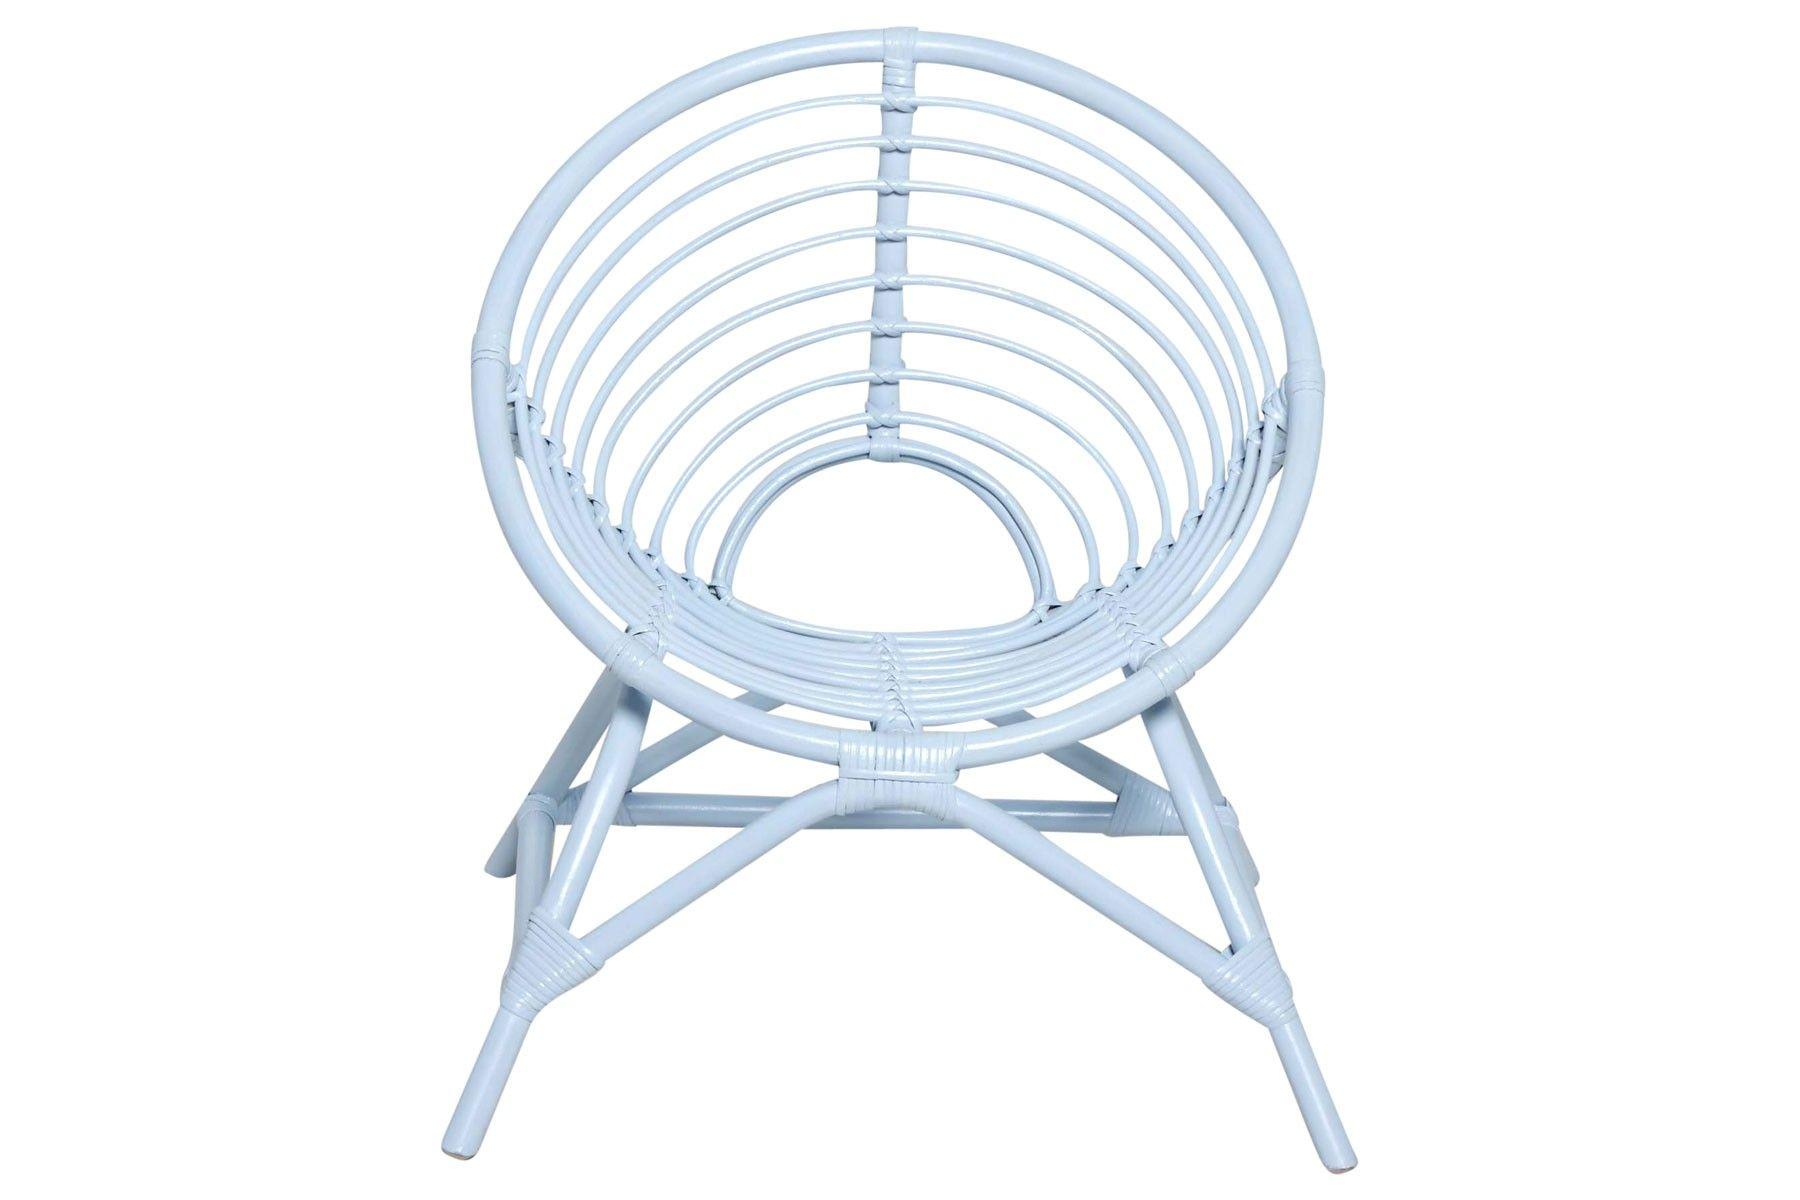 Stoel Sissy Boy : Stoel circle chair kids stoel meubilair homeland u au a sissy